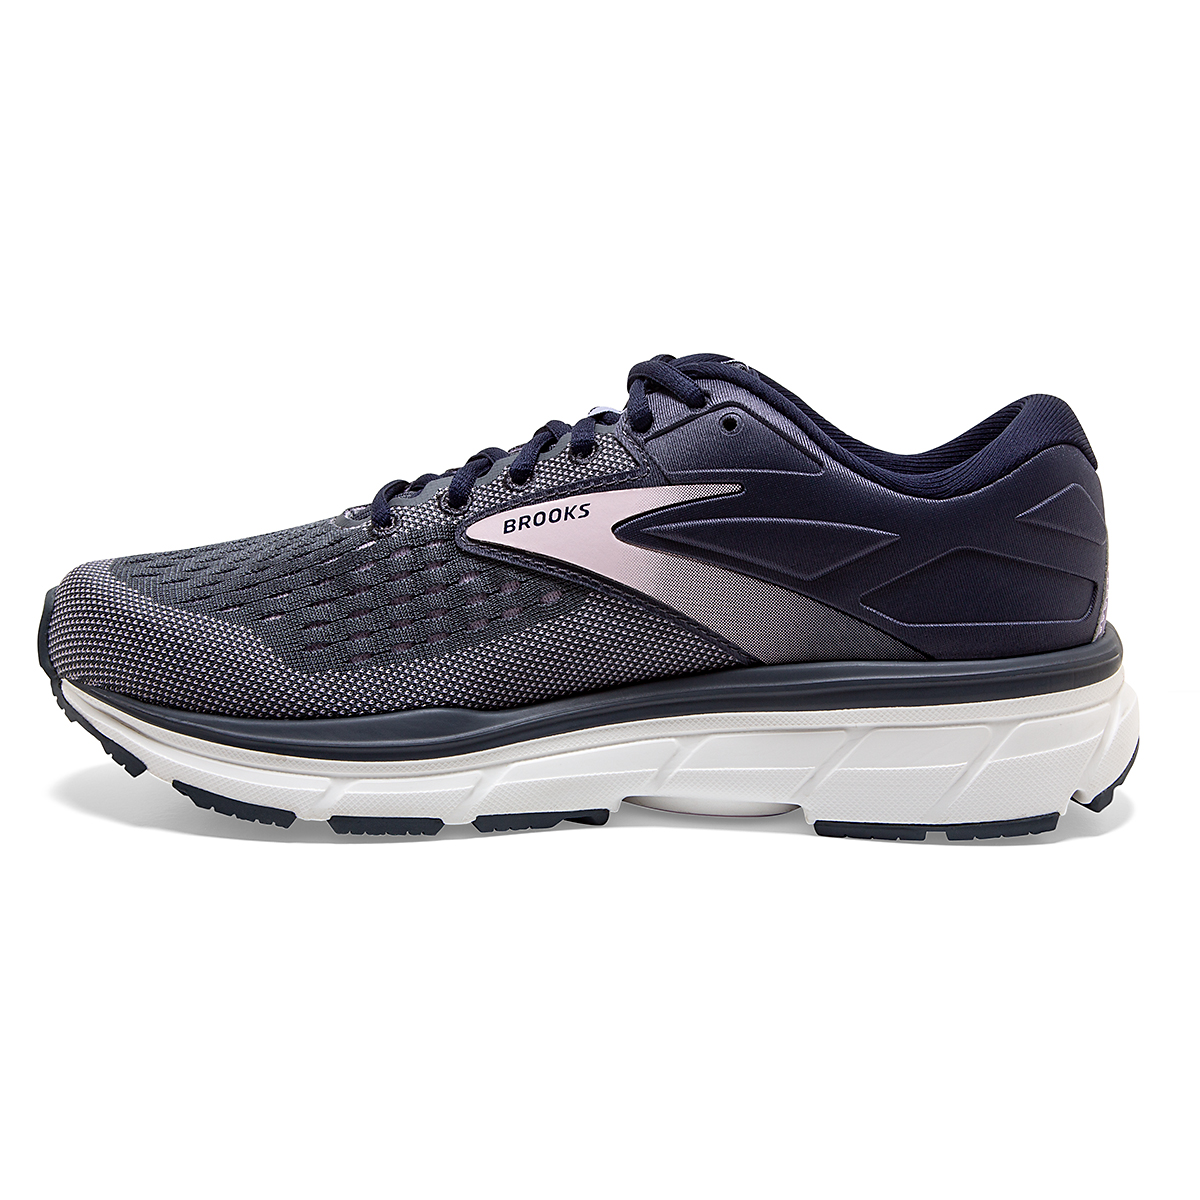 Women's Brooks Dyad 11 Running Shoe - Color: Ombre/Primrose  - Size: 6 - Width: Regular, Ombre/Primrose, large, image 2